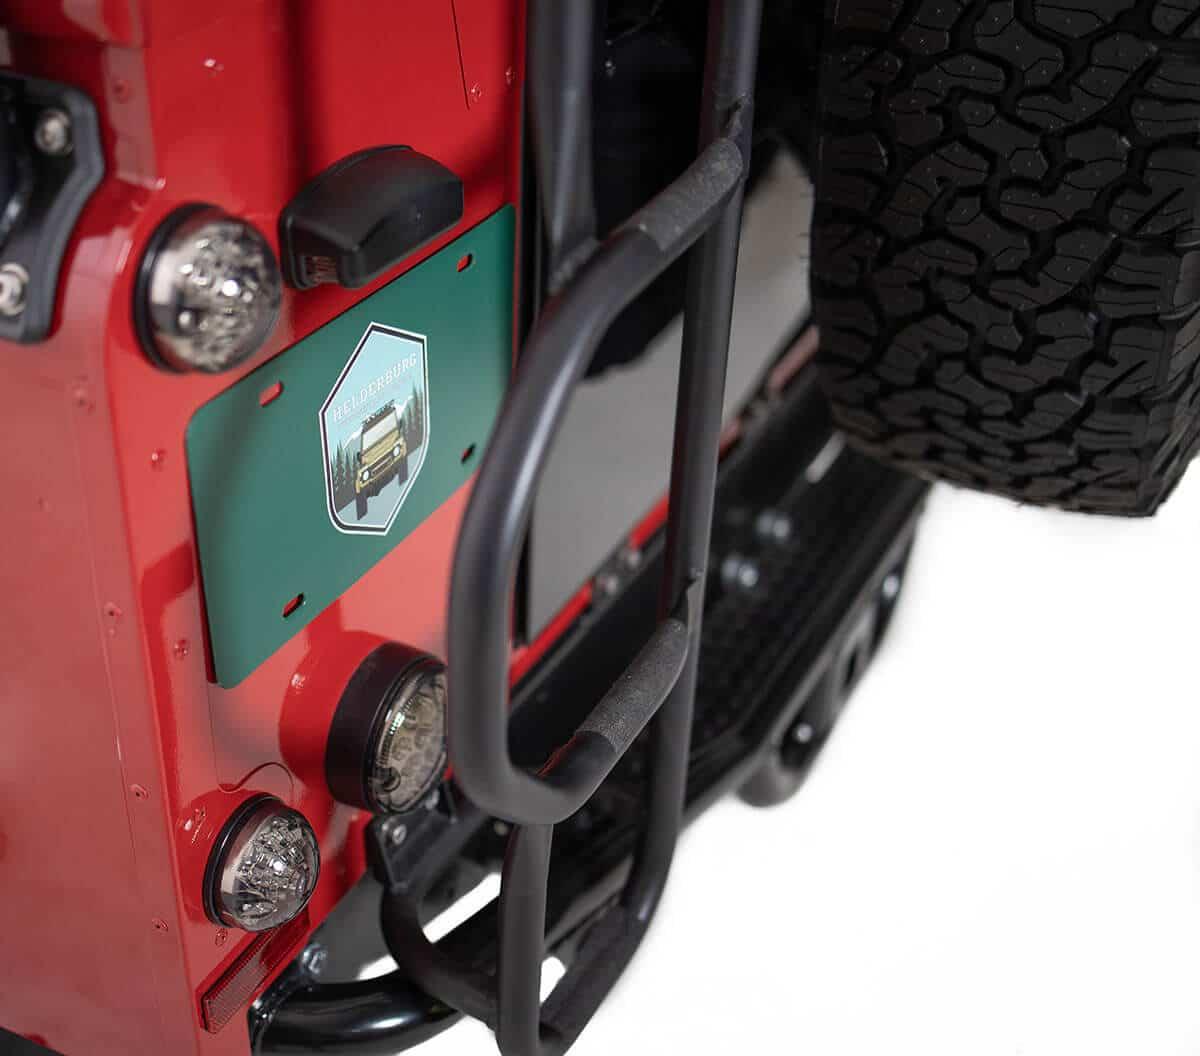 Helderburg Land Rover Defender D110 - Exterior Details: Helderburg Branding and Roof Access Ladder